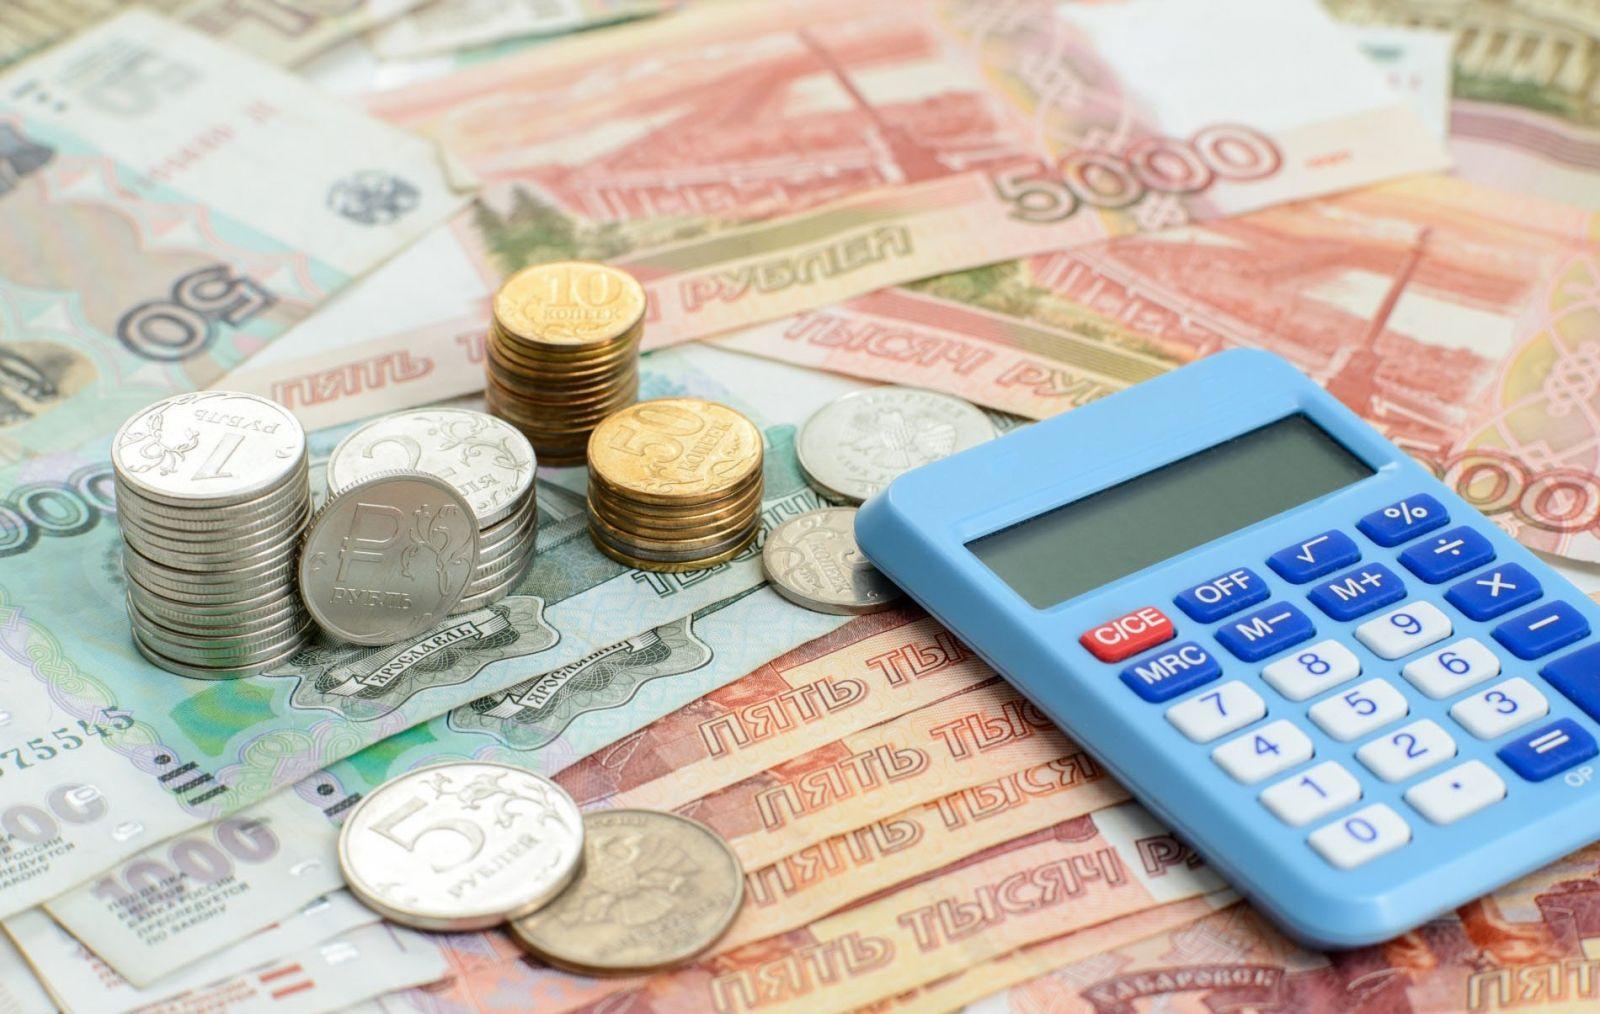 Якутяне реструктурировали кредиты на 8 млрд рублей